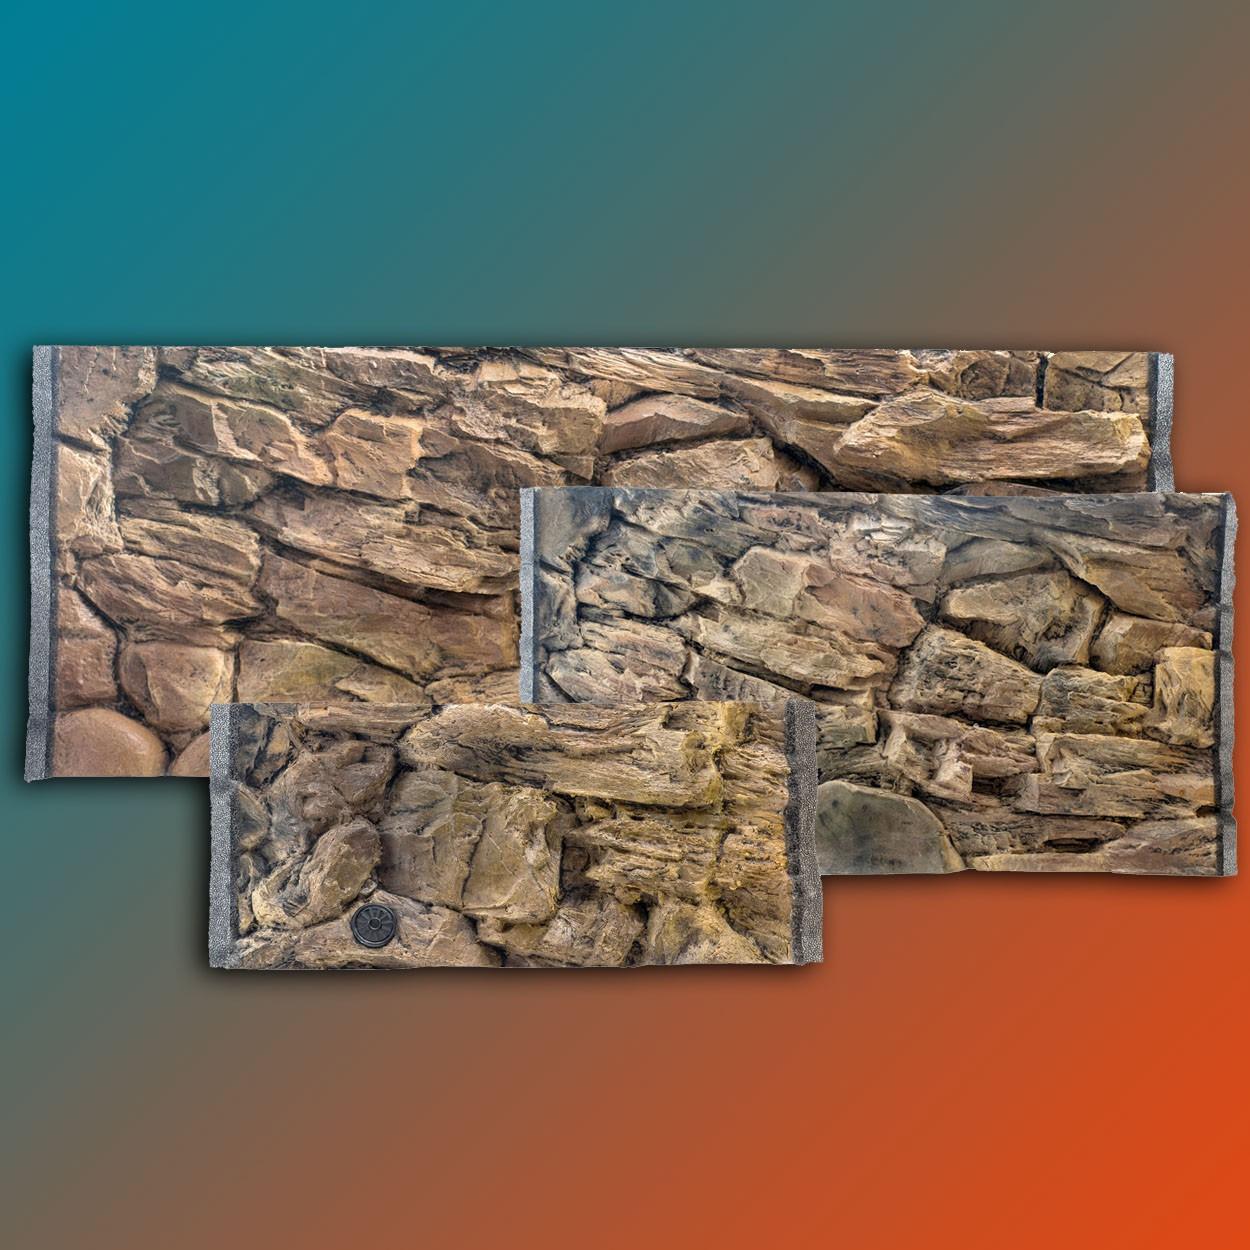 3d aquarium r ckwand s line verschiedene gr en terrarium. Black Bedroom Furniture Sets. Home Design Ideas